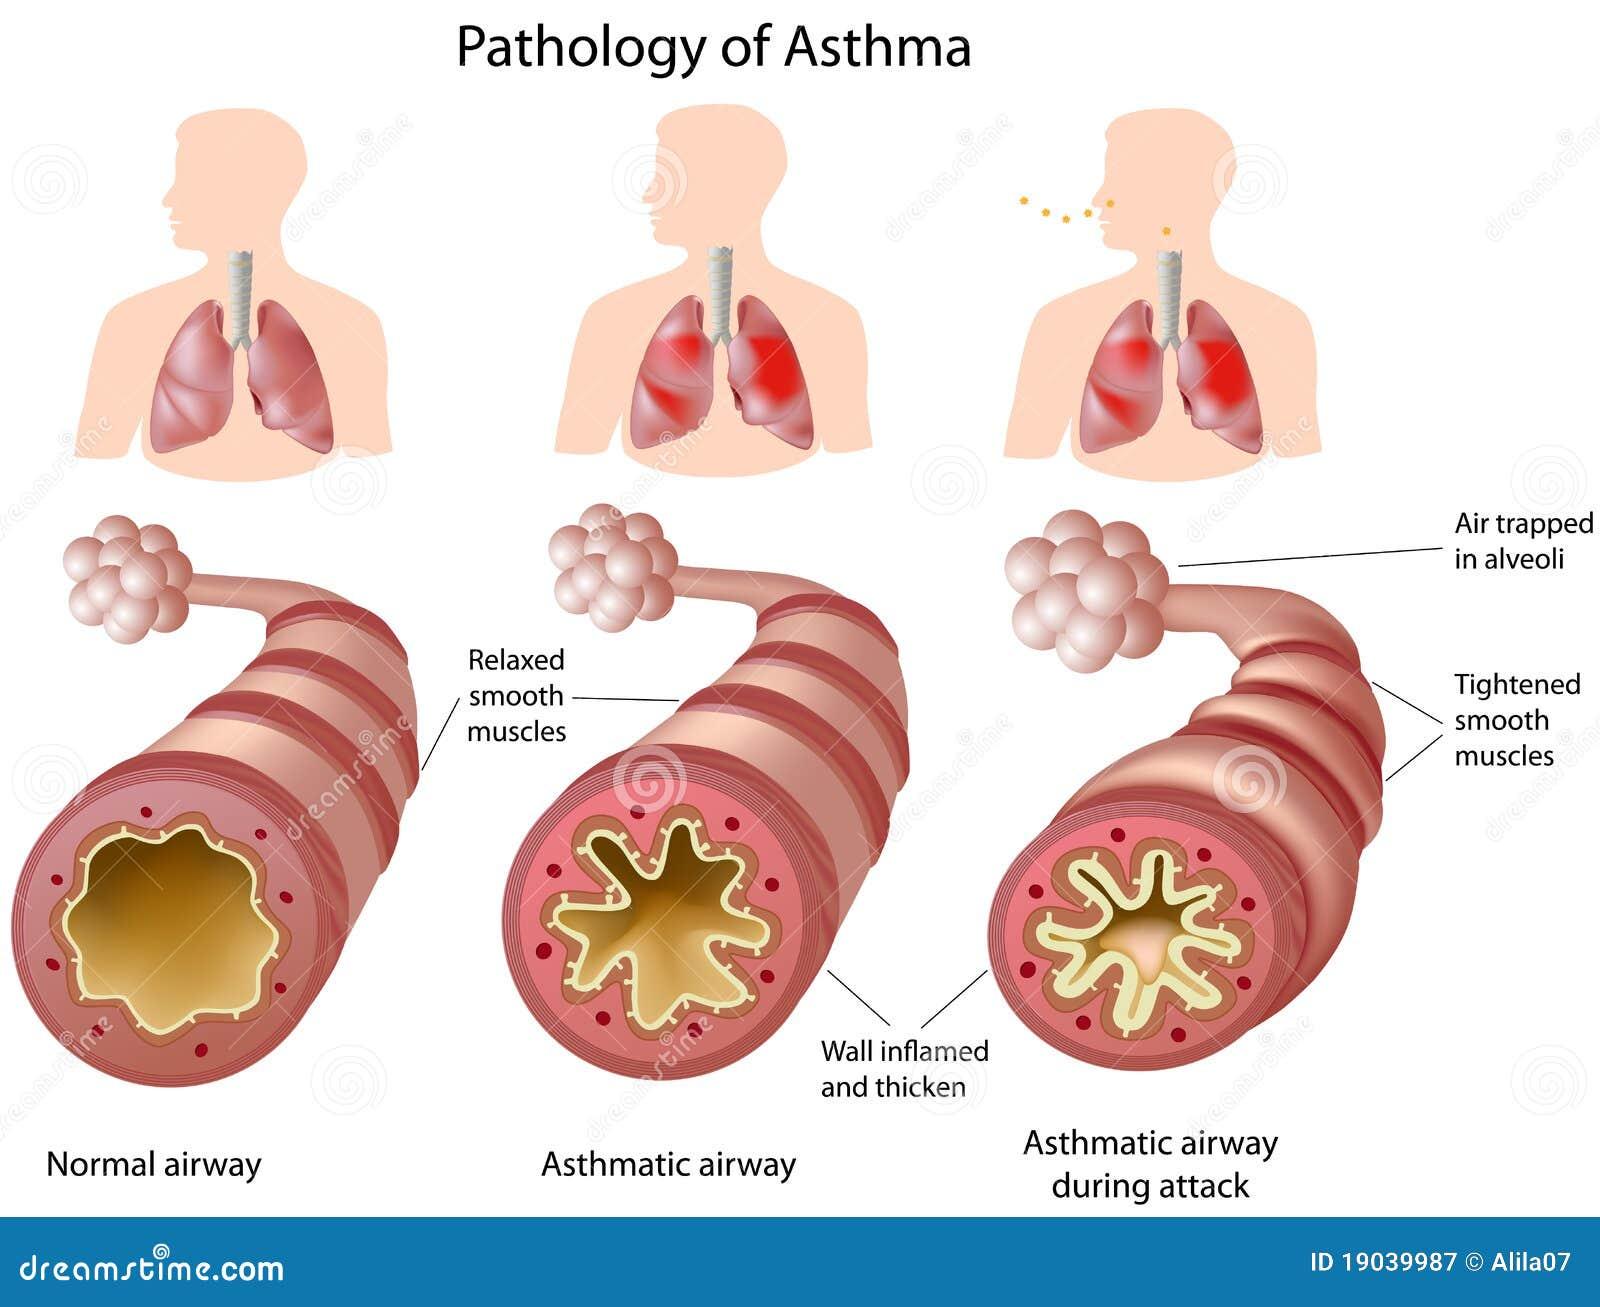 Bathroom Designers Anatomy Of Asthma Royalty Free Stock Photography Image